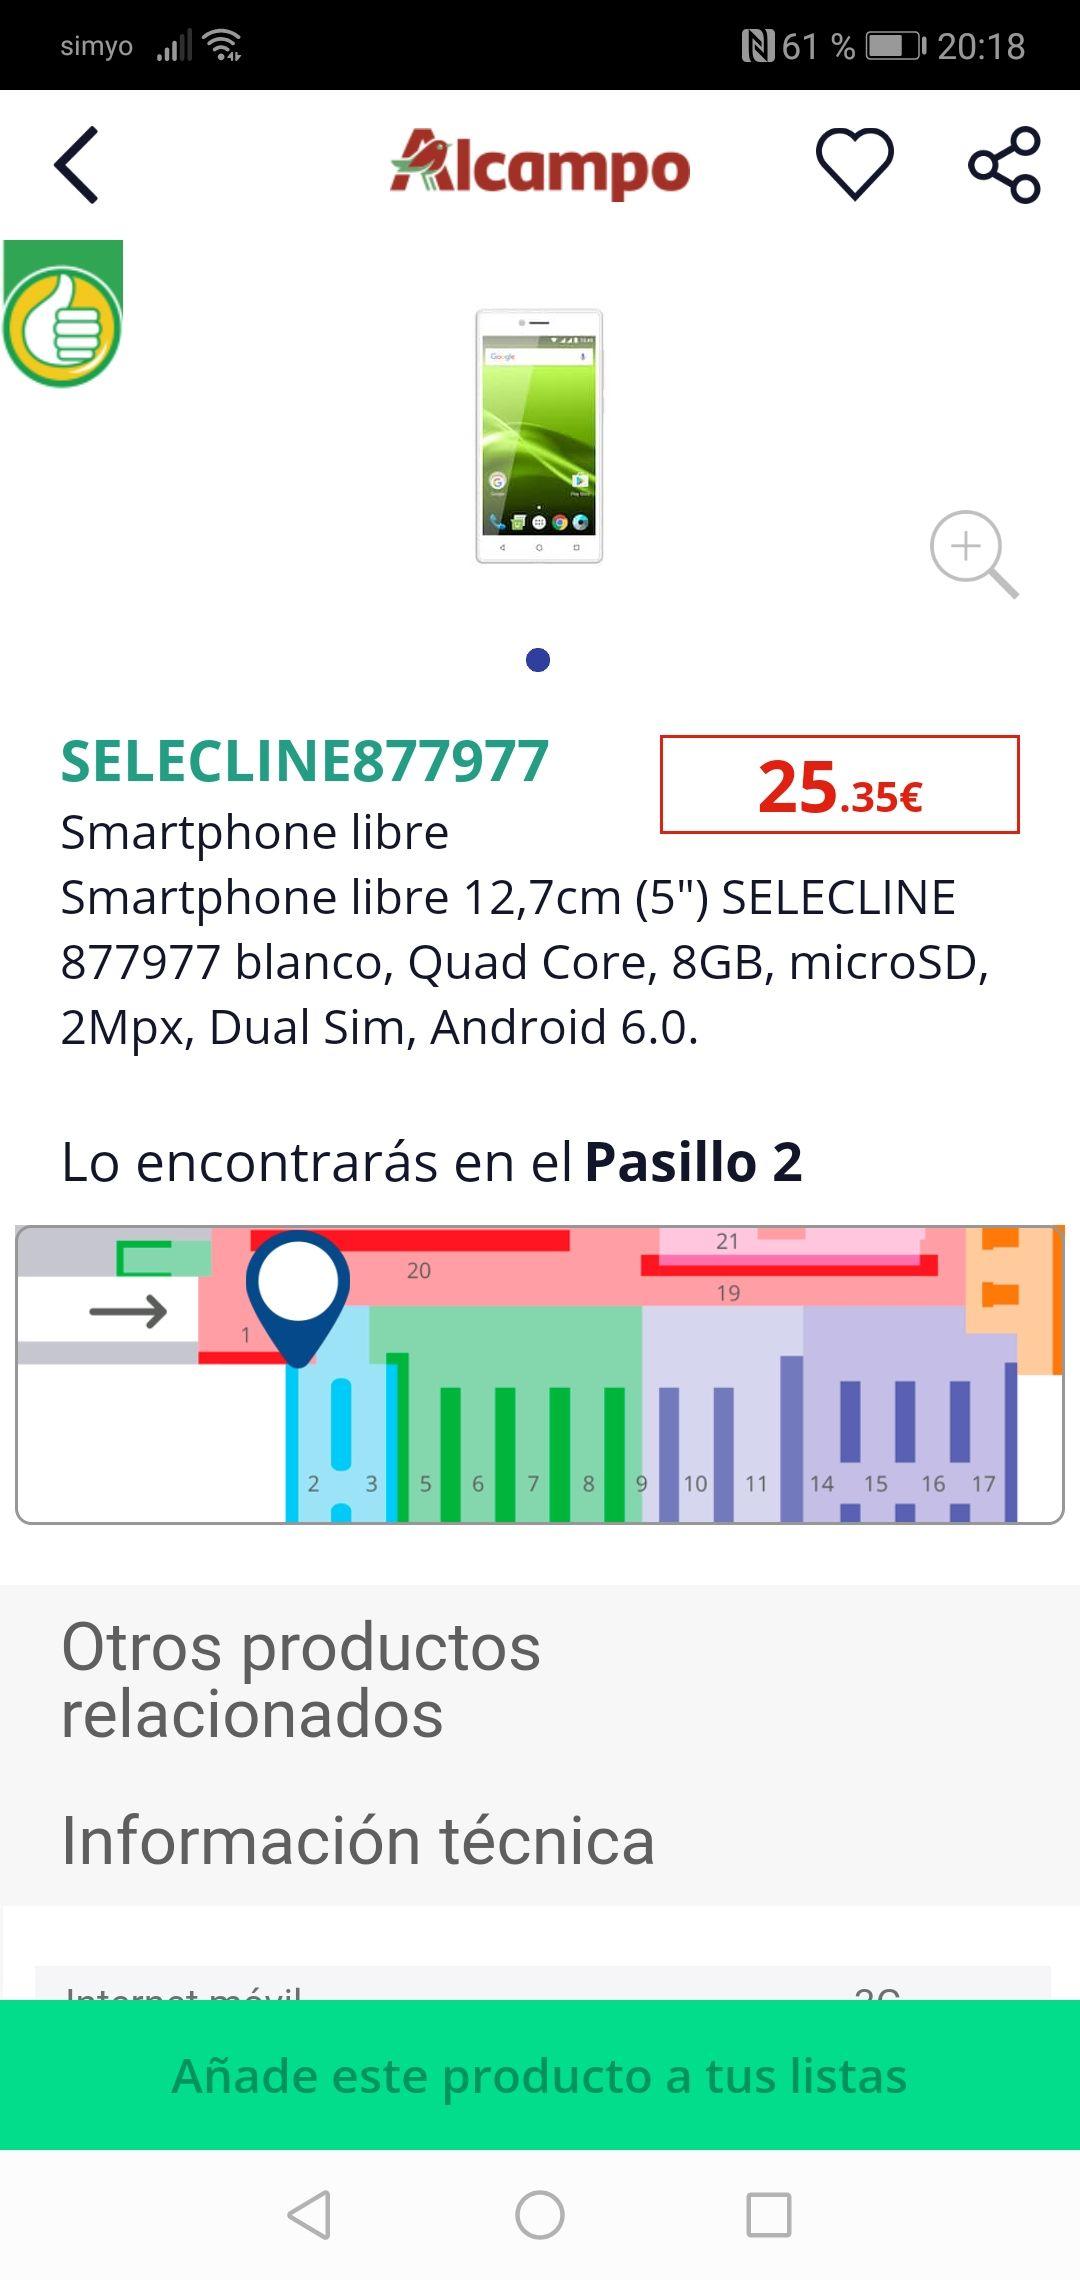 Movil muy barato Alcampo Huesca (Desde la app de alcampo)